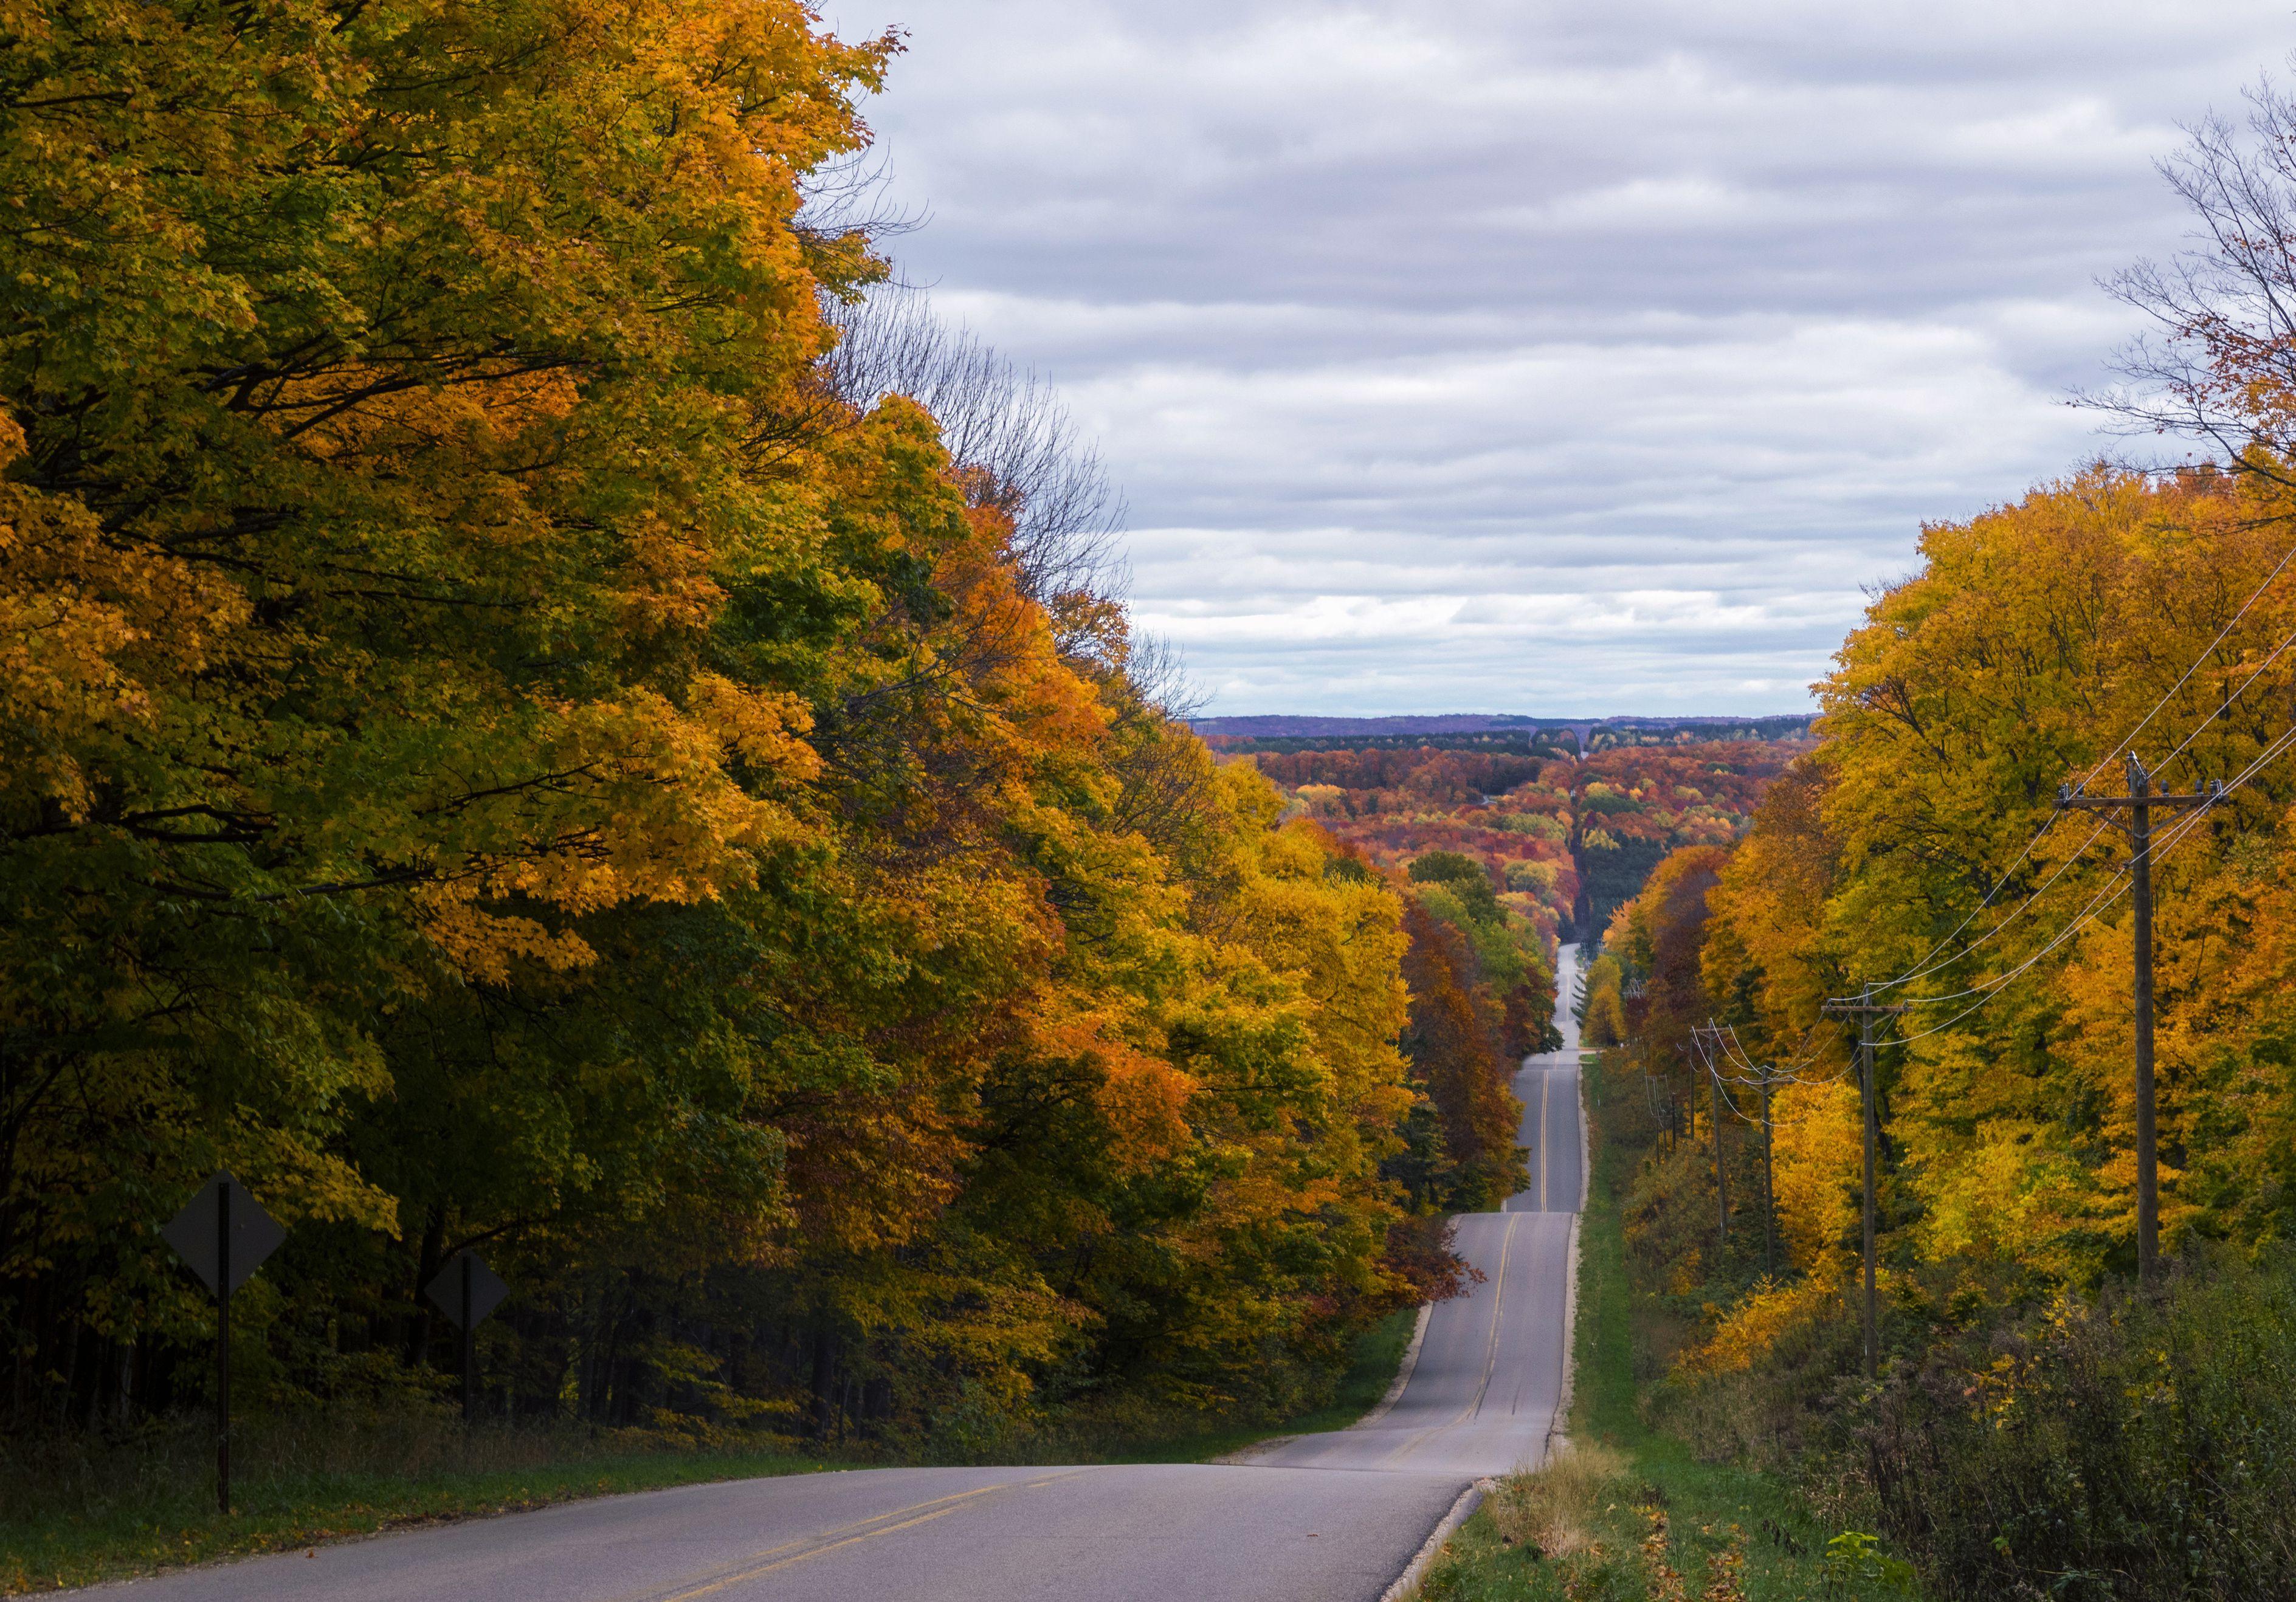 Tree lined road, Autumn, Harbor Springs, Michigan, United States, North America